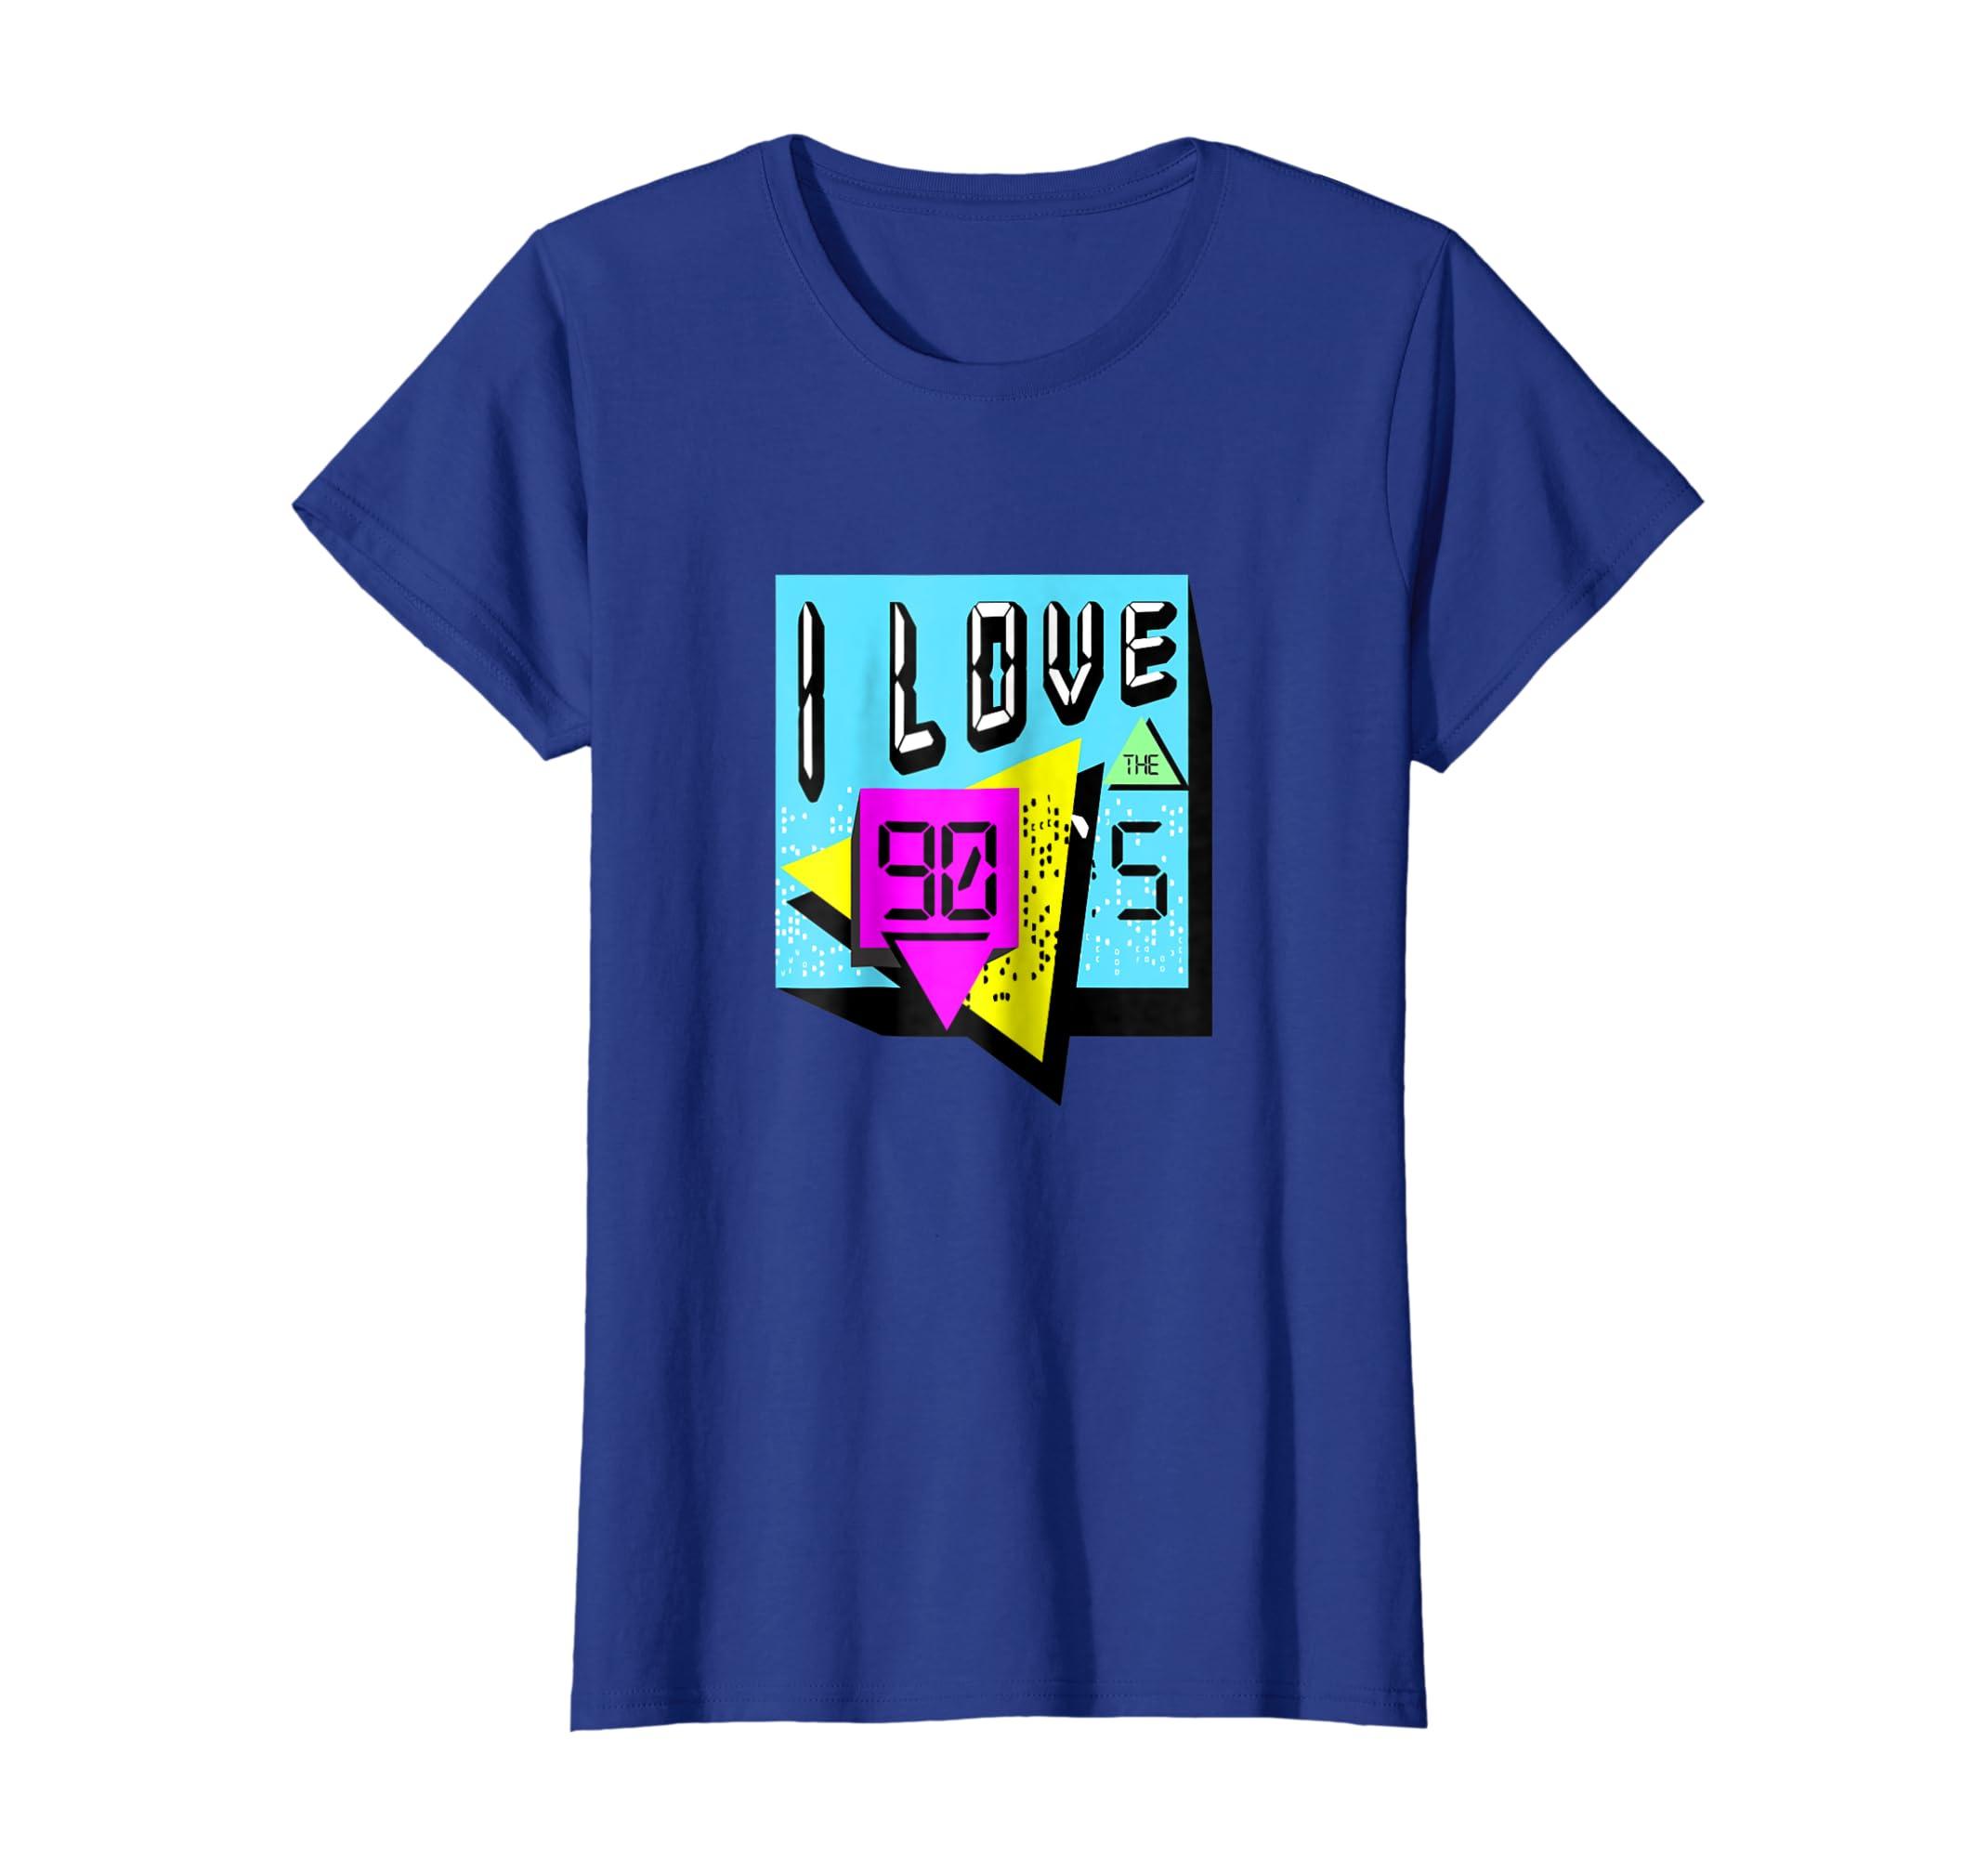 Amazon Com Retro 90s T Shirt I Love The 90s Clothing Clothing